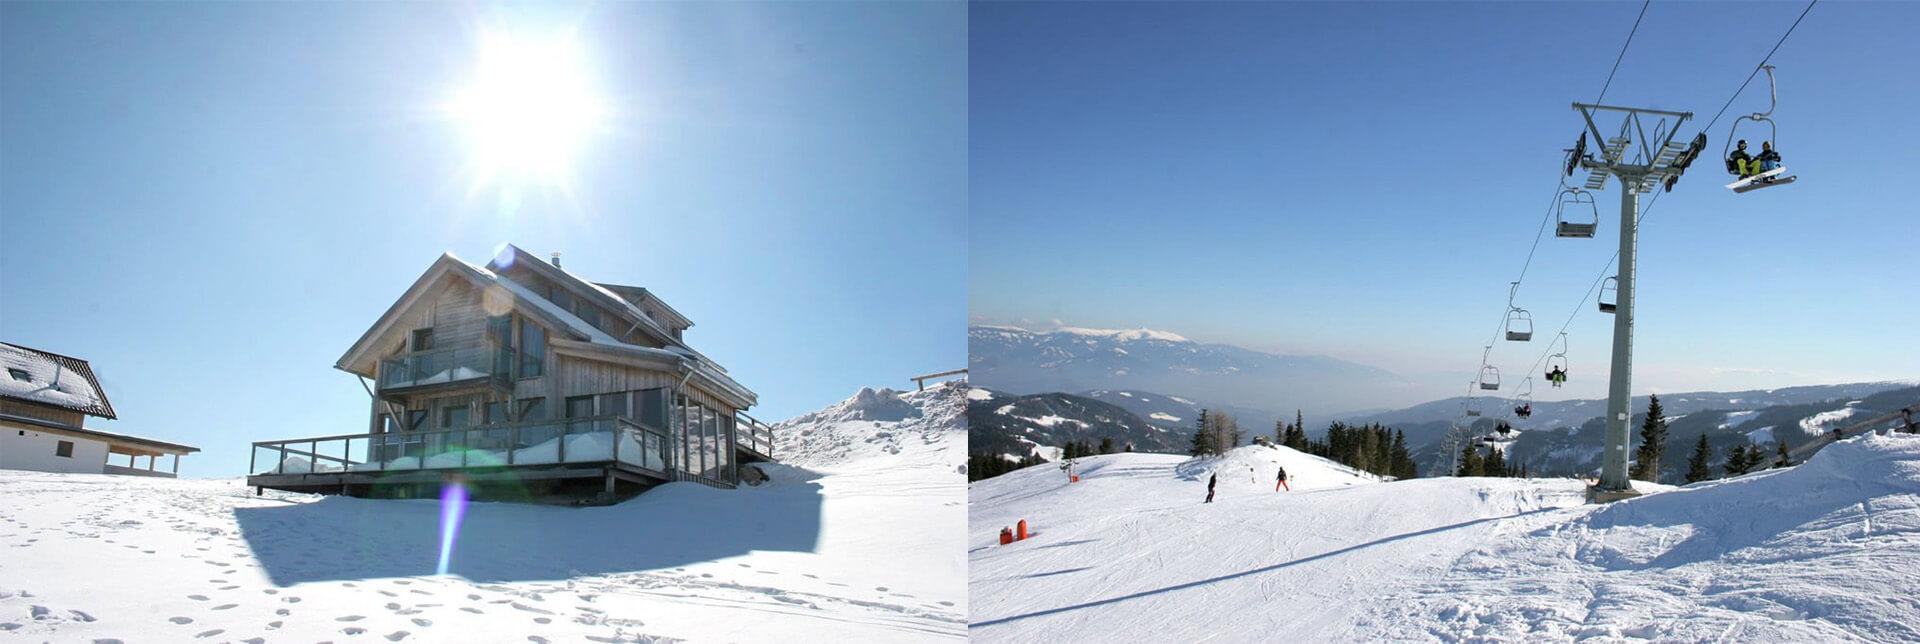 banner-winter-1